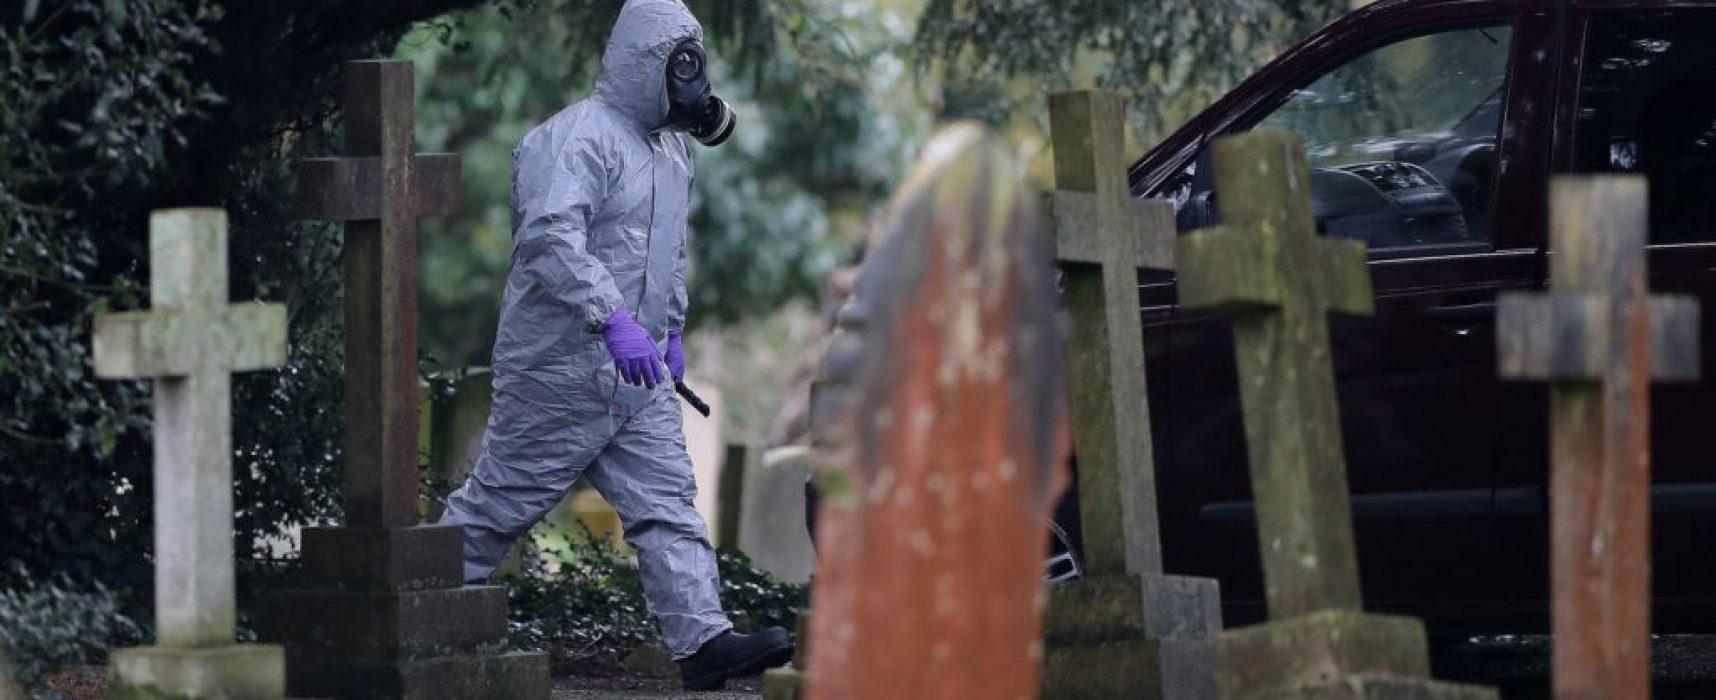 Novichok Poisoning: Russia's Version #38 – False